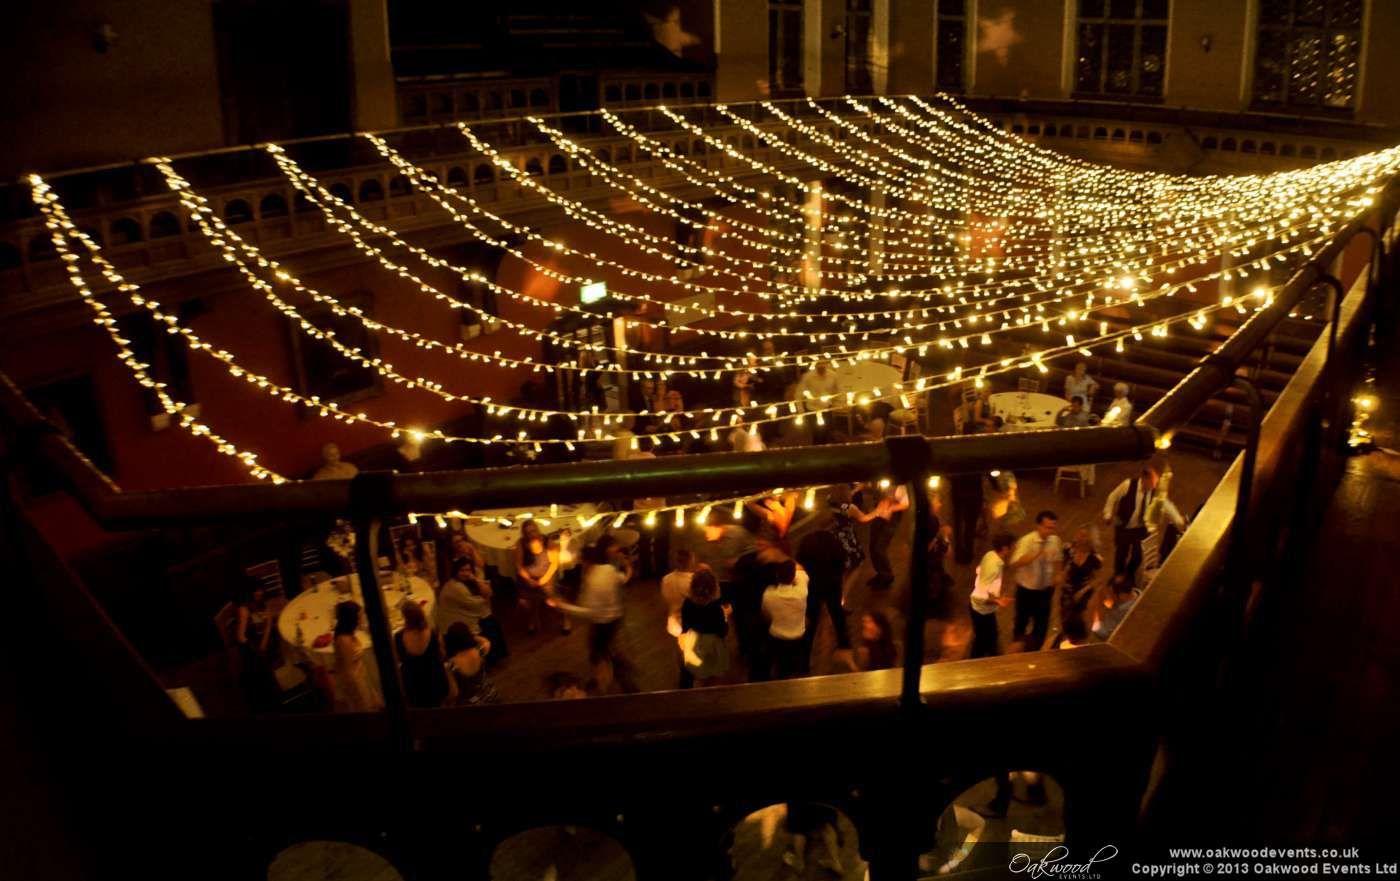 #Fairy Light canopy for an outdoor summer evening event  sc 1 st  Pinterest & Fairy Light canopy for an outdoor summer evening event | dreamy ...